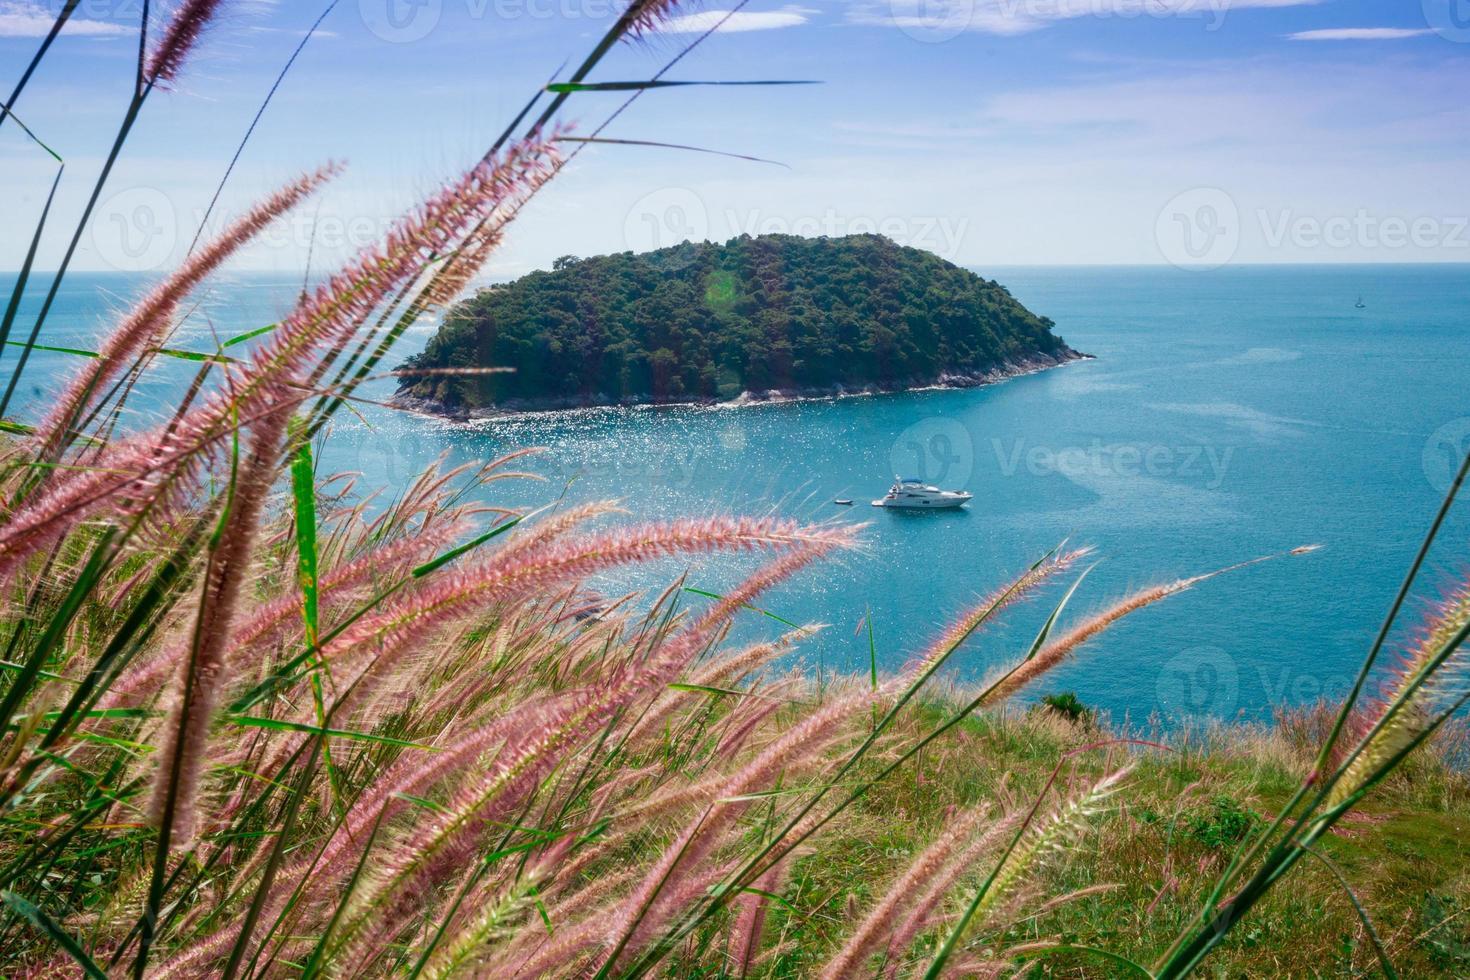 horario de verano en asia tailandia playa cielo azul, phuket foto